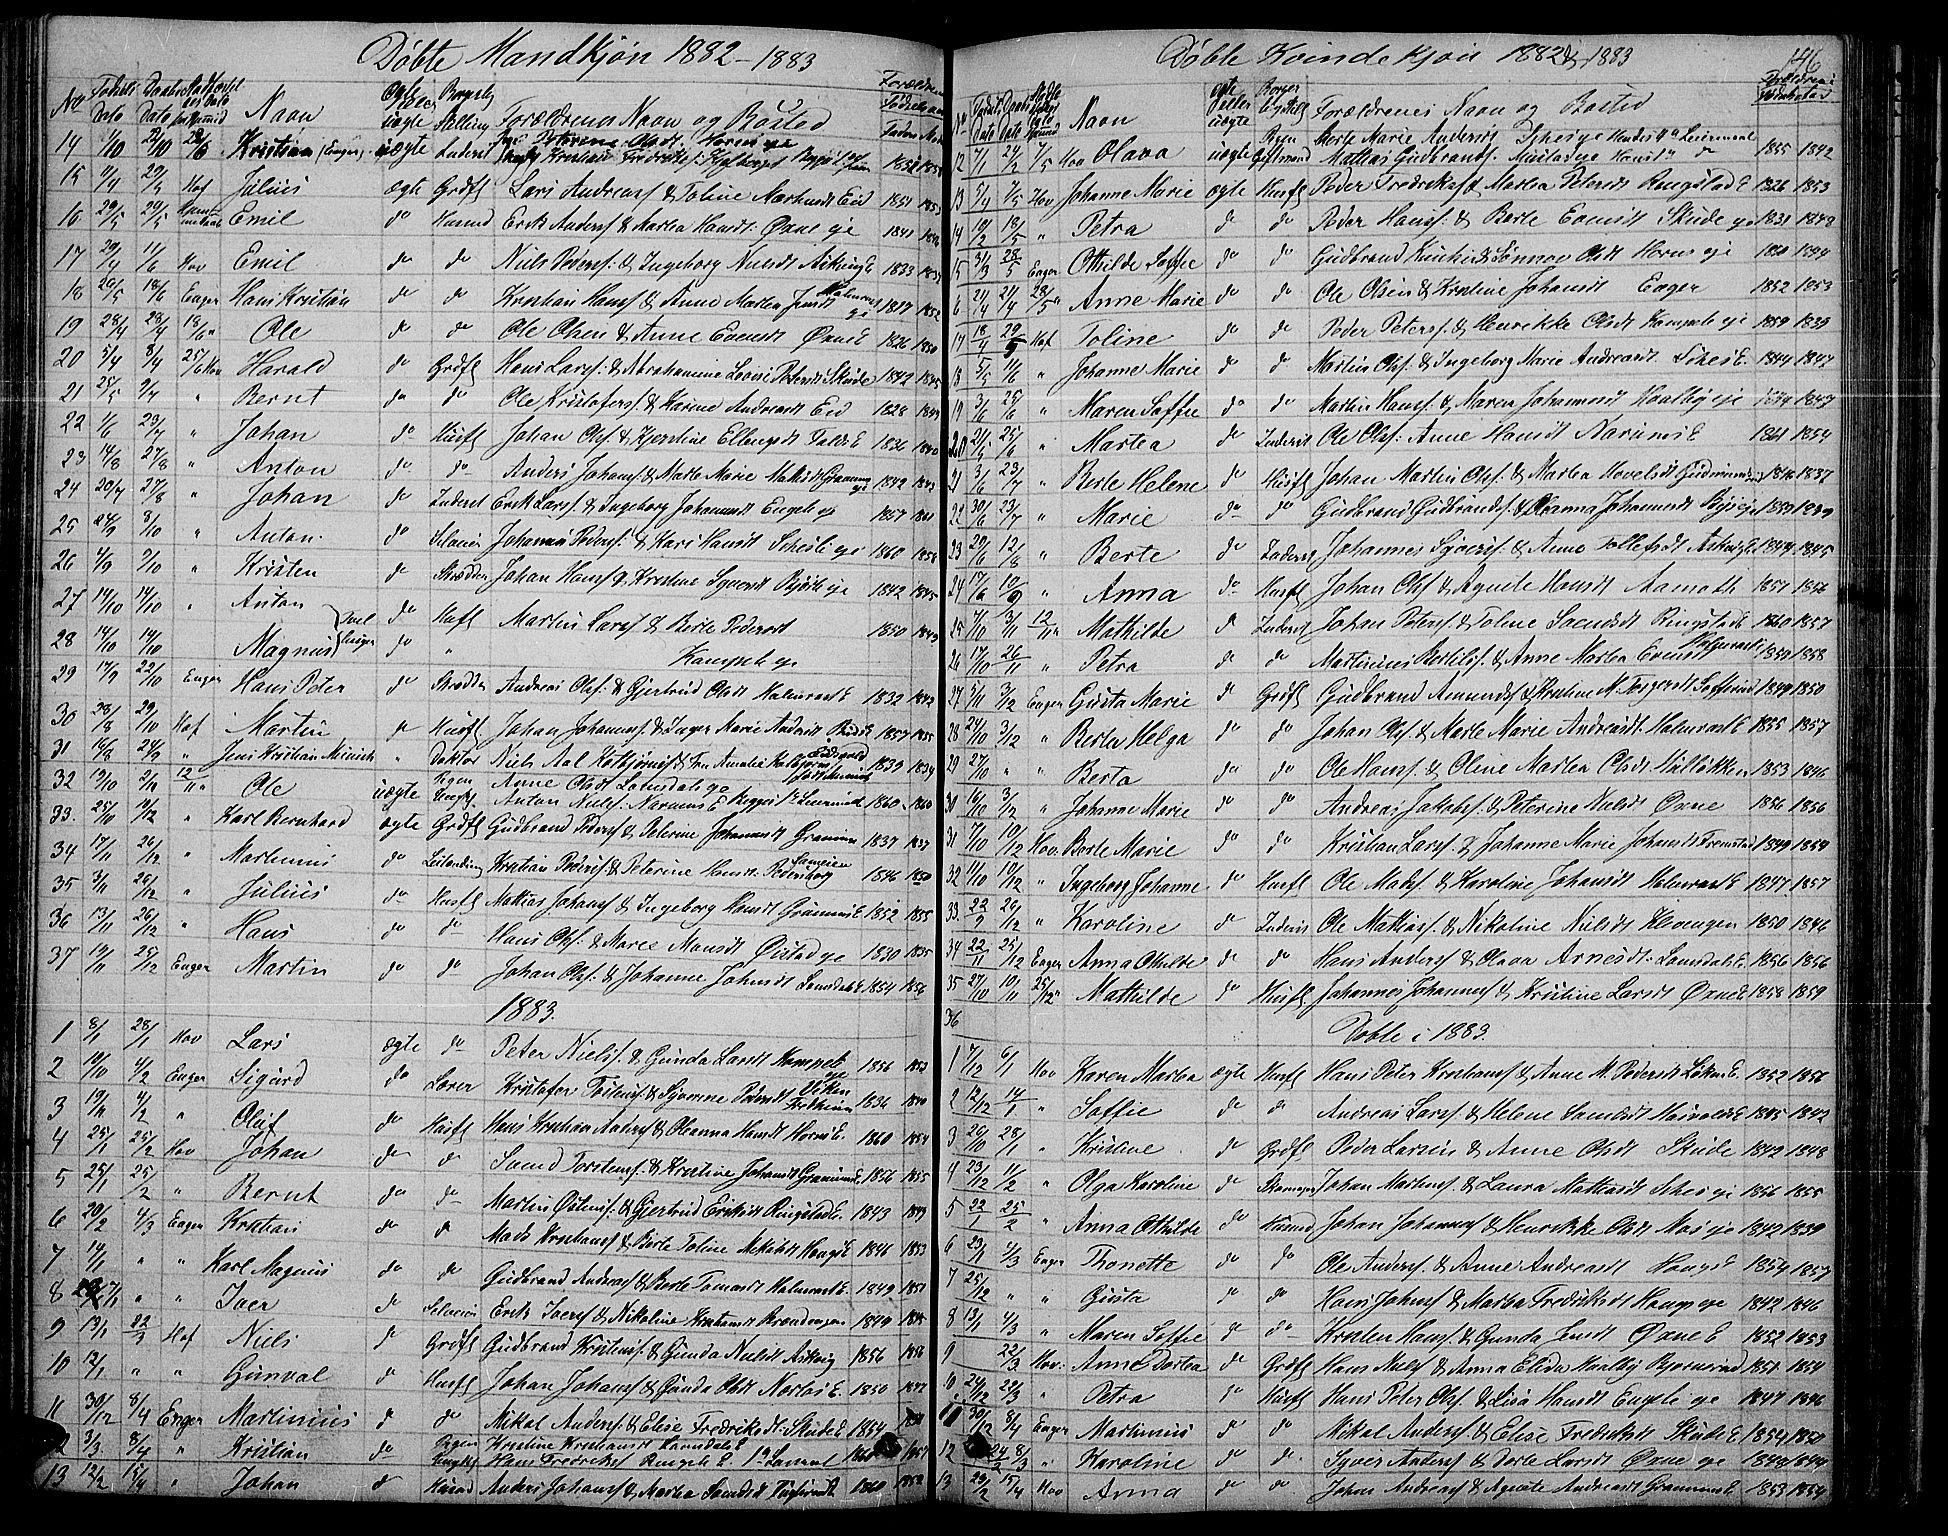 SAH, Søndre Land prestekontor, L/L0001: Klokkerbok nr. 1, 1849-1883, s. 146